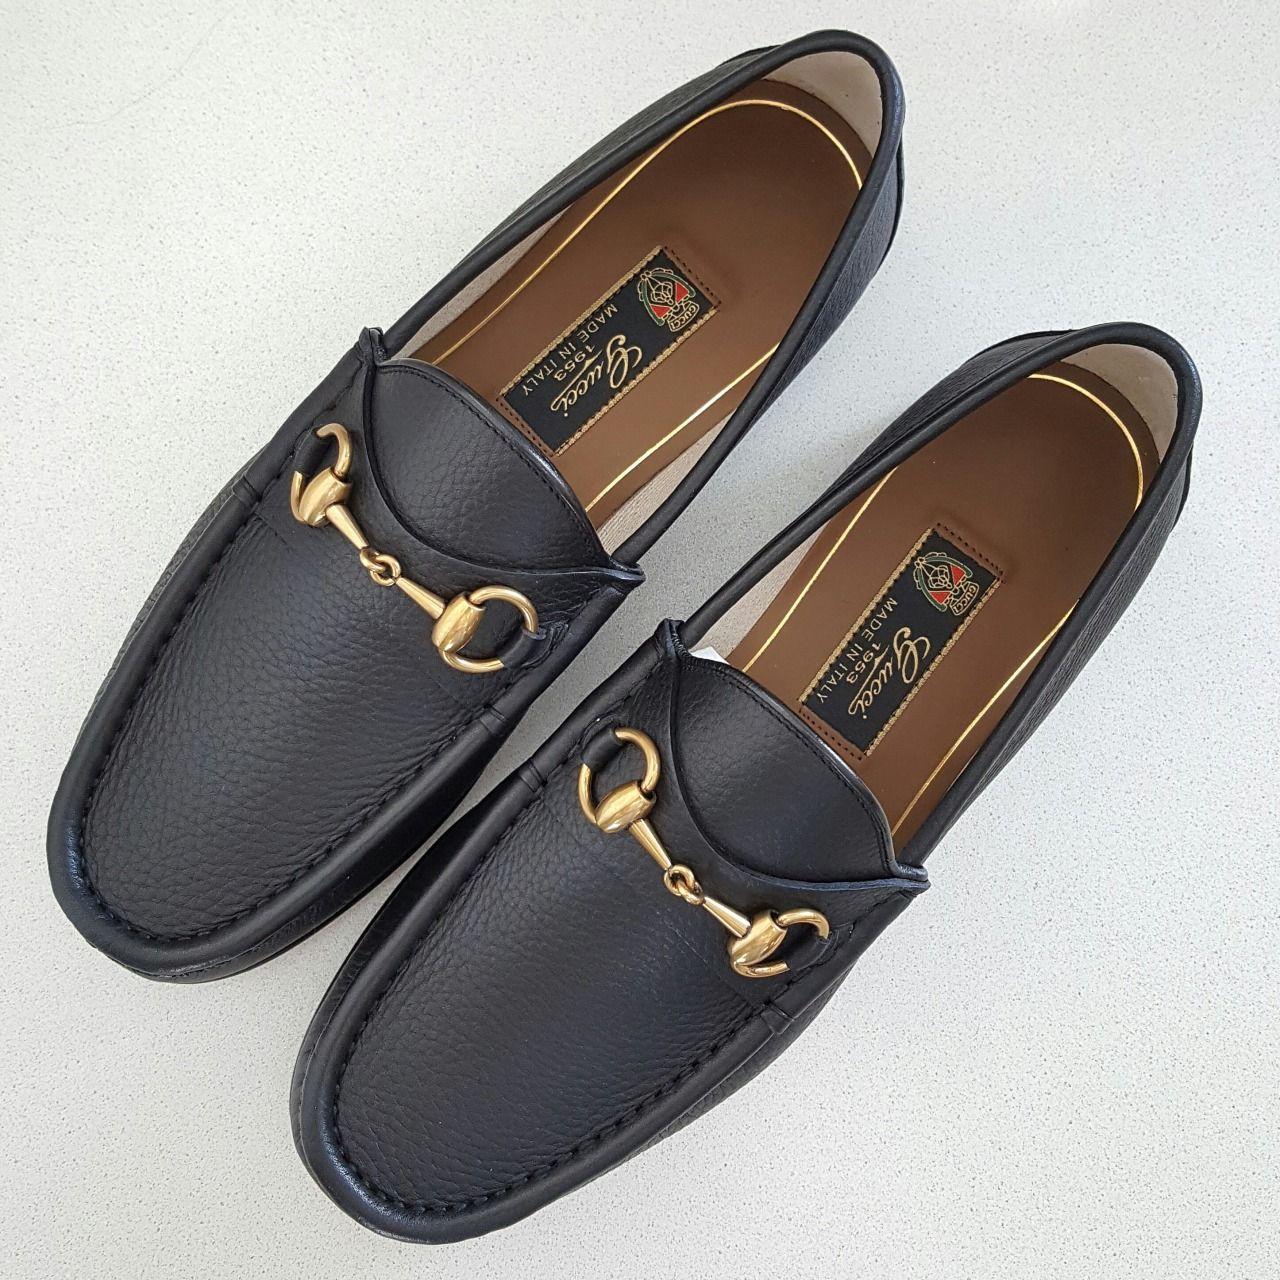 928a1e05153 Gucci Horsebit-Loafer